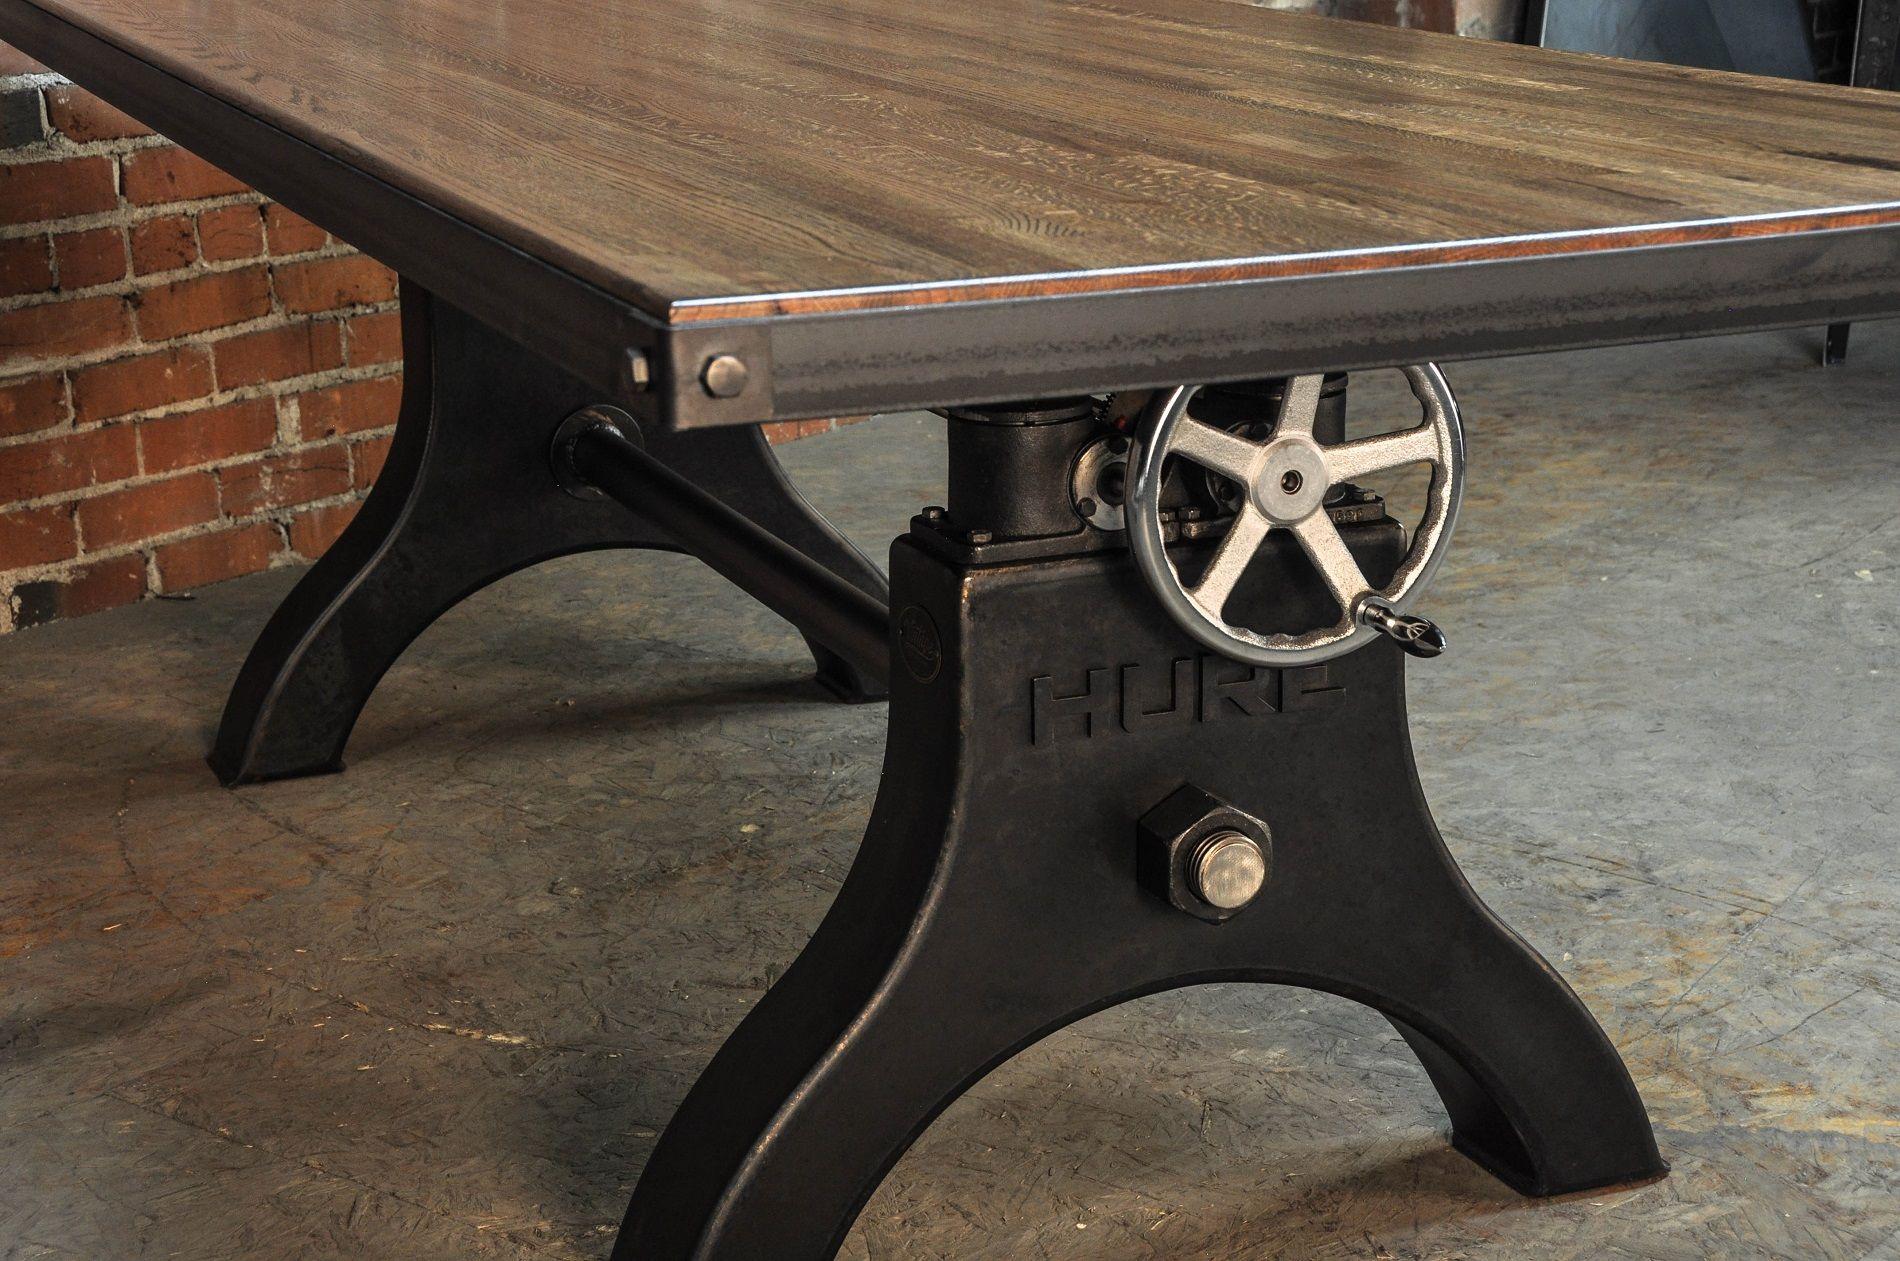 Dining Table | Vintage Industrial Furniture | Art Studio Dreams ...